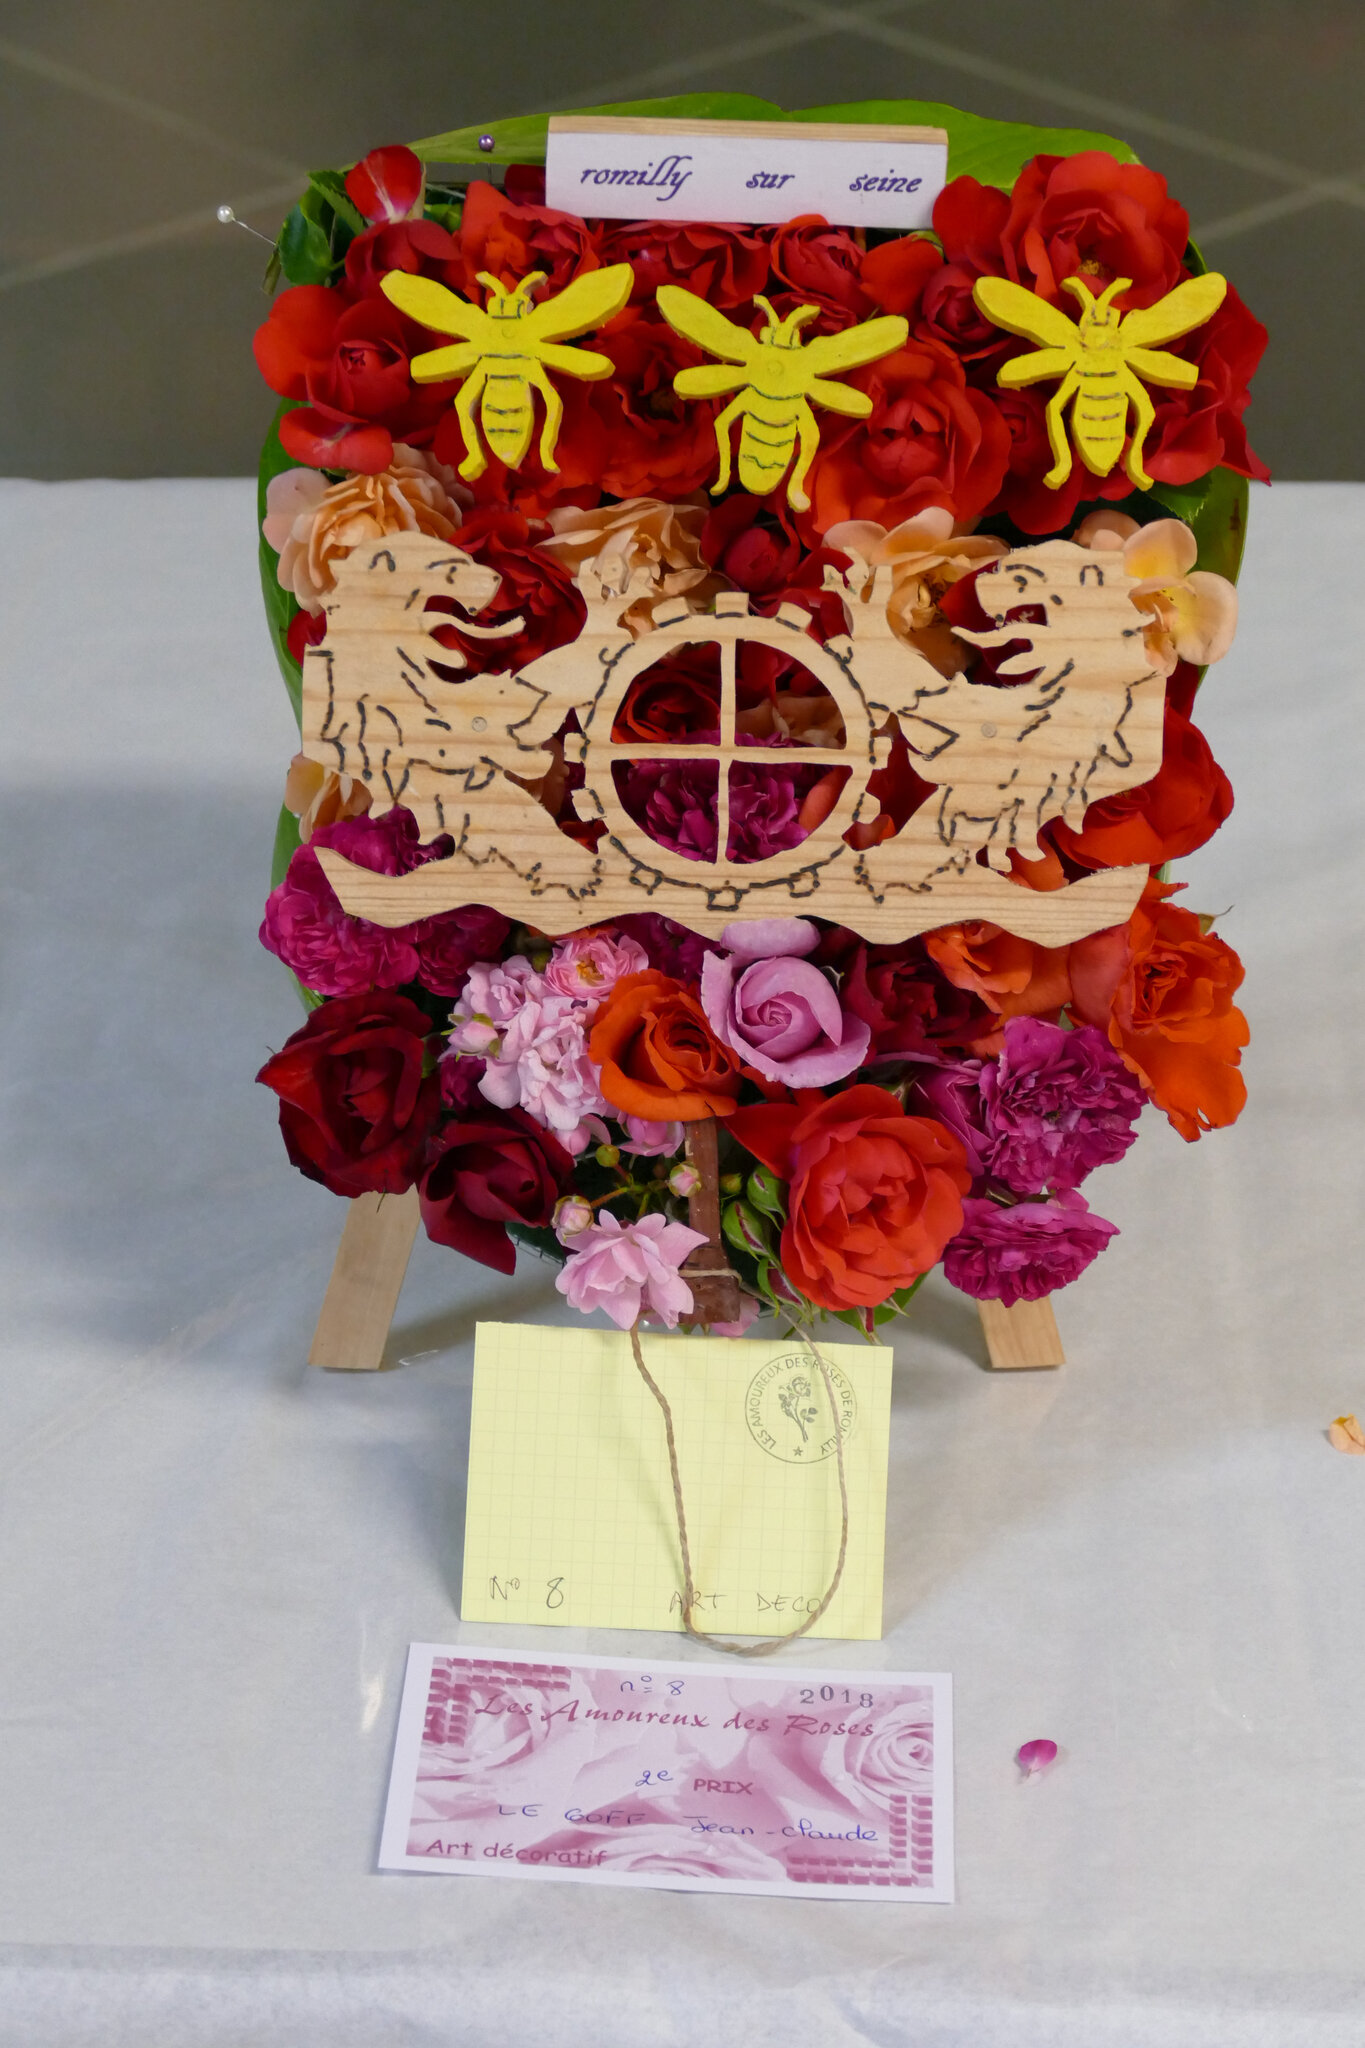 Exposition de roses 2018